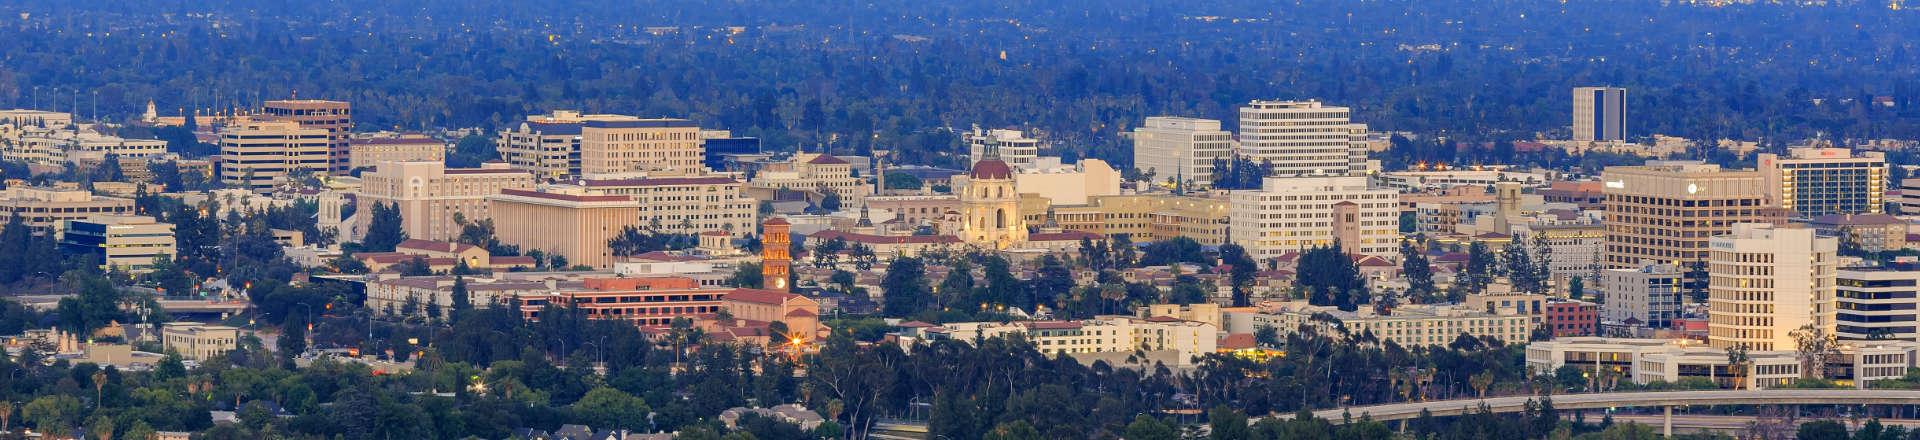 panoramic view of Pasadena, CA